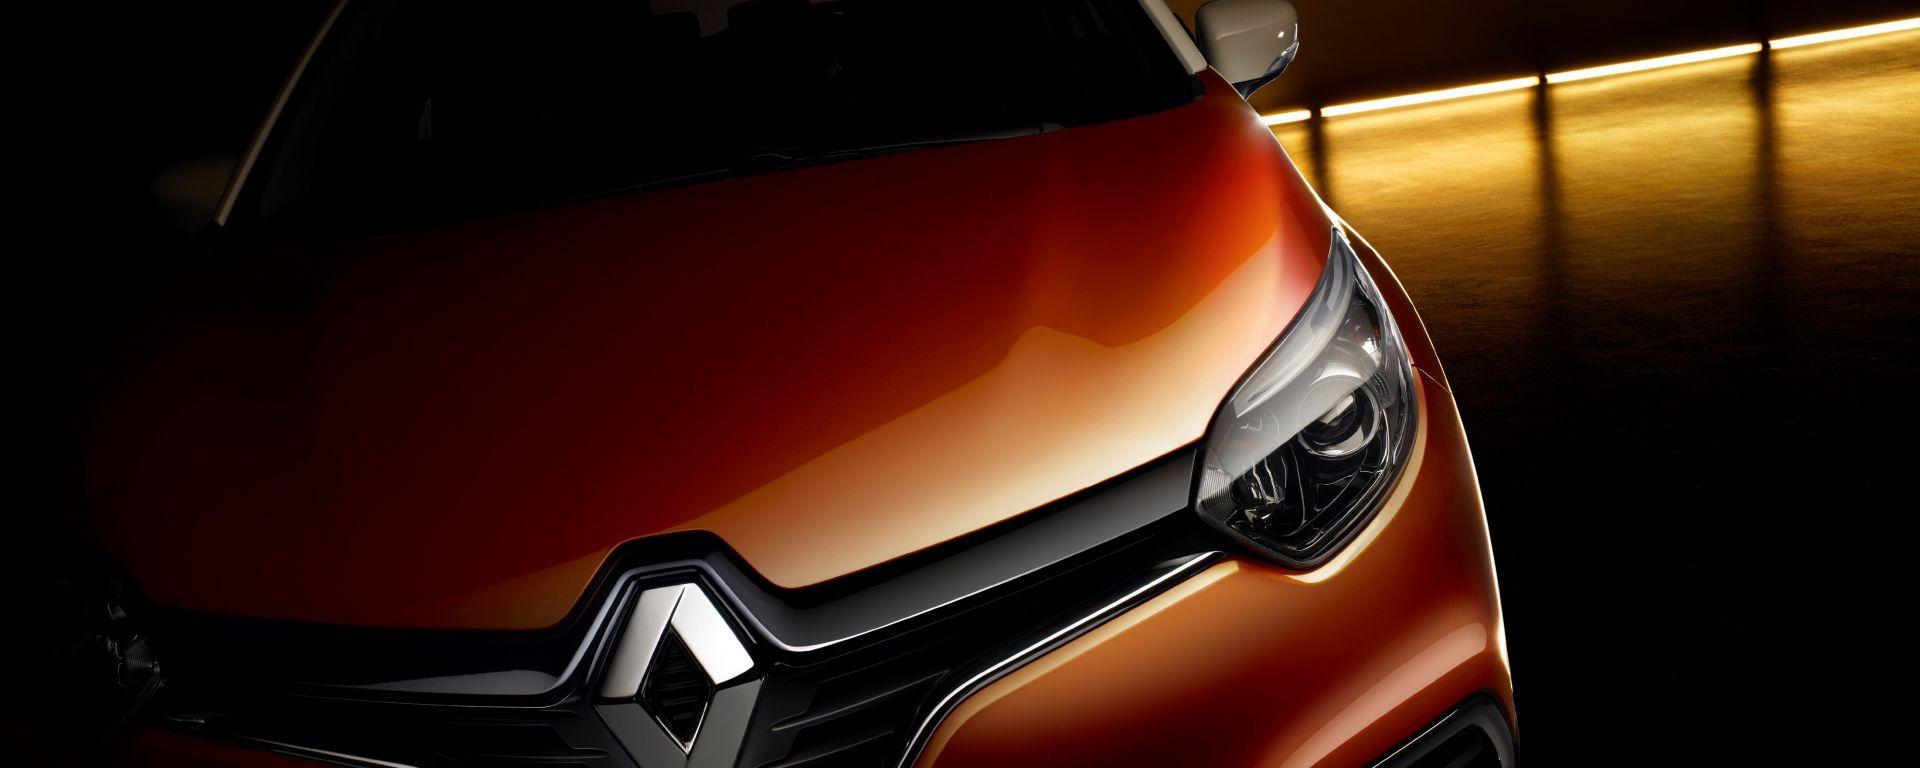 Renault Captur: il primo teaser